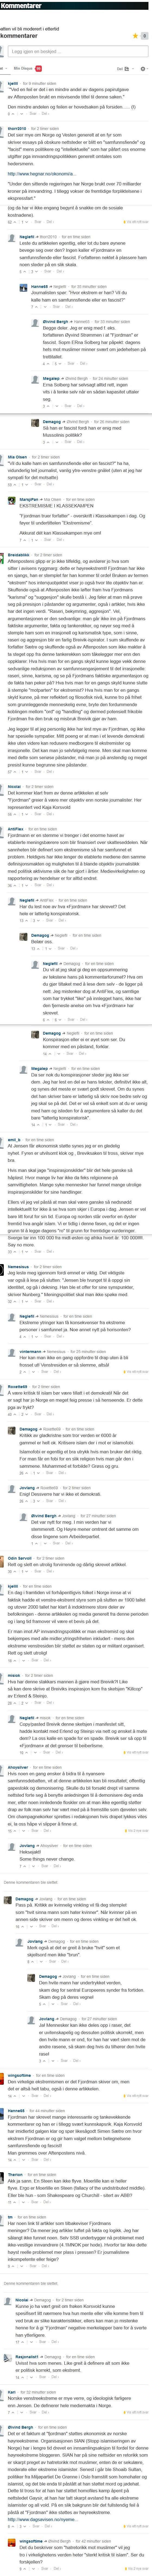 aftenposten-kommentarfelt-fjordman-artikkel-17-4-2013